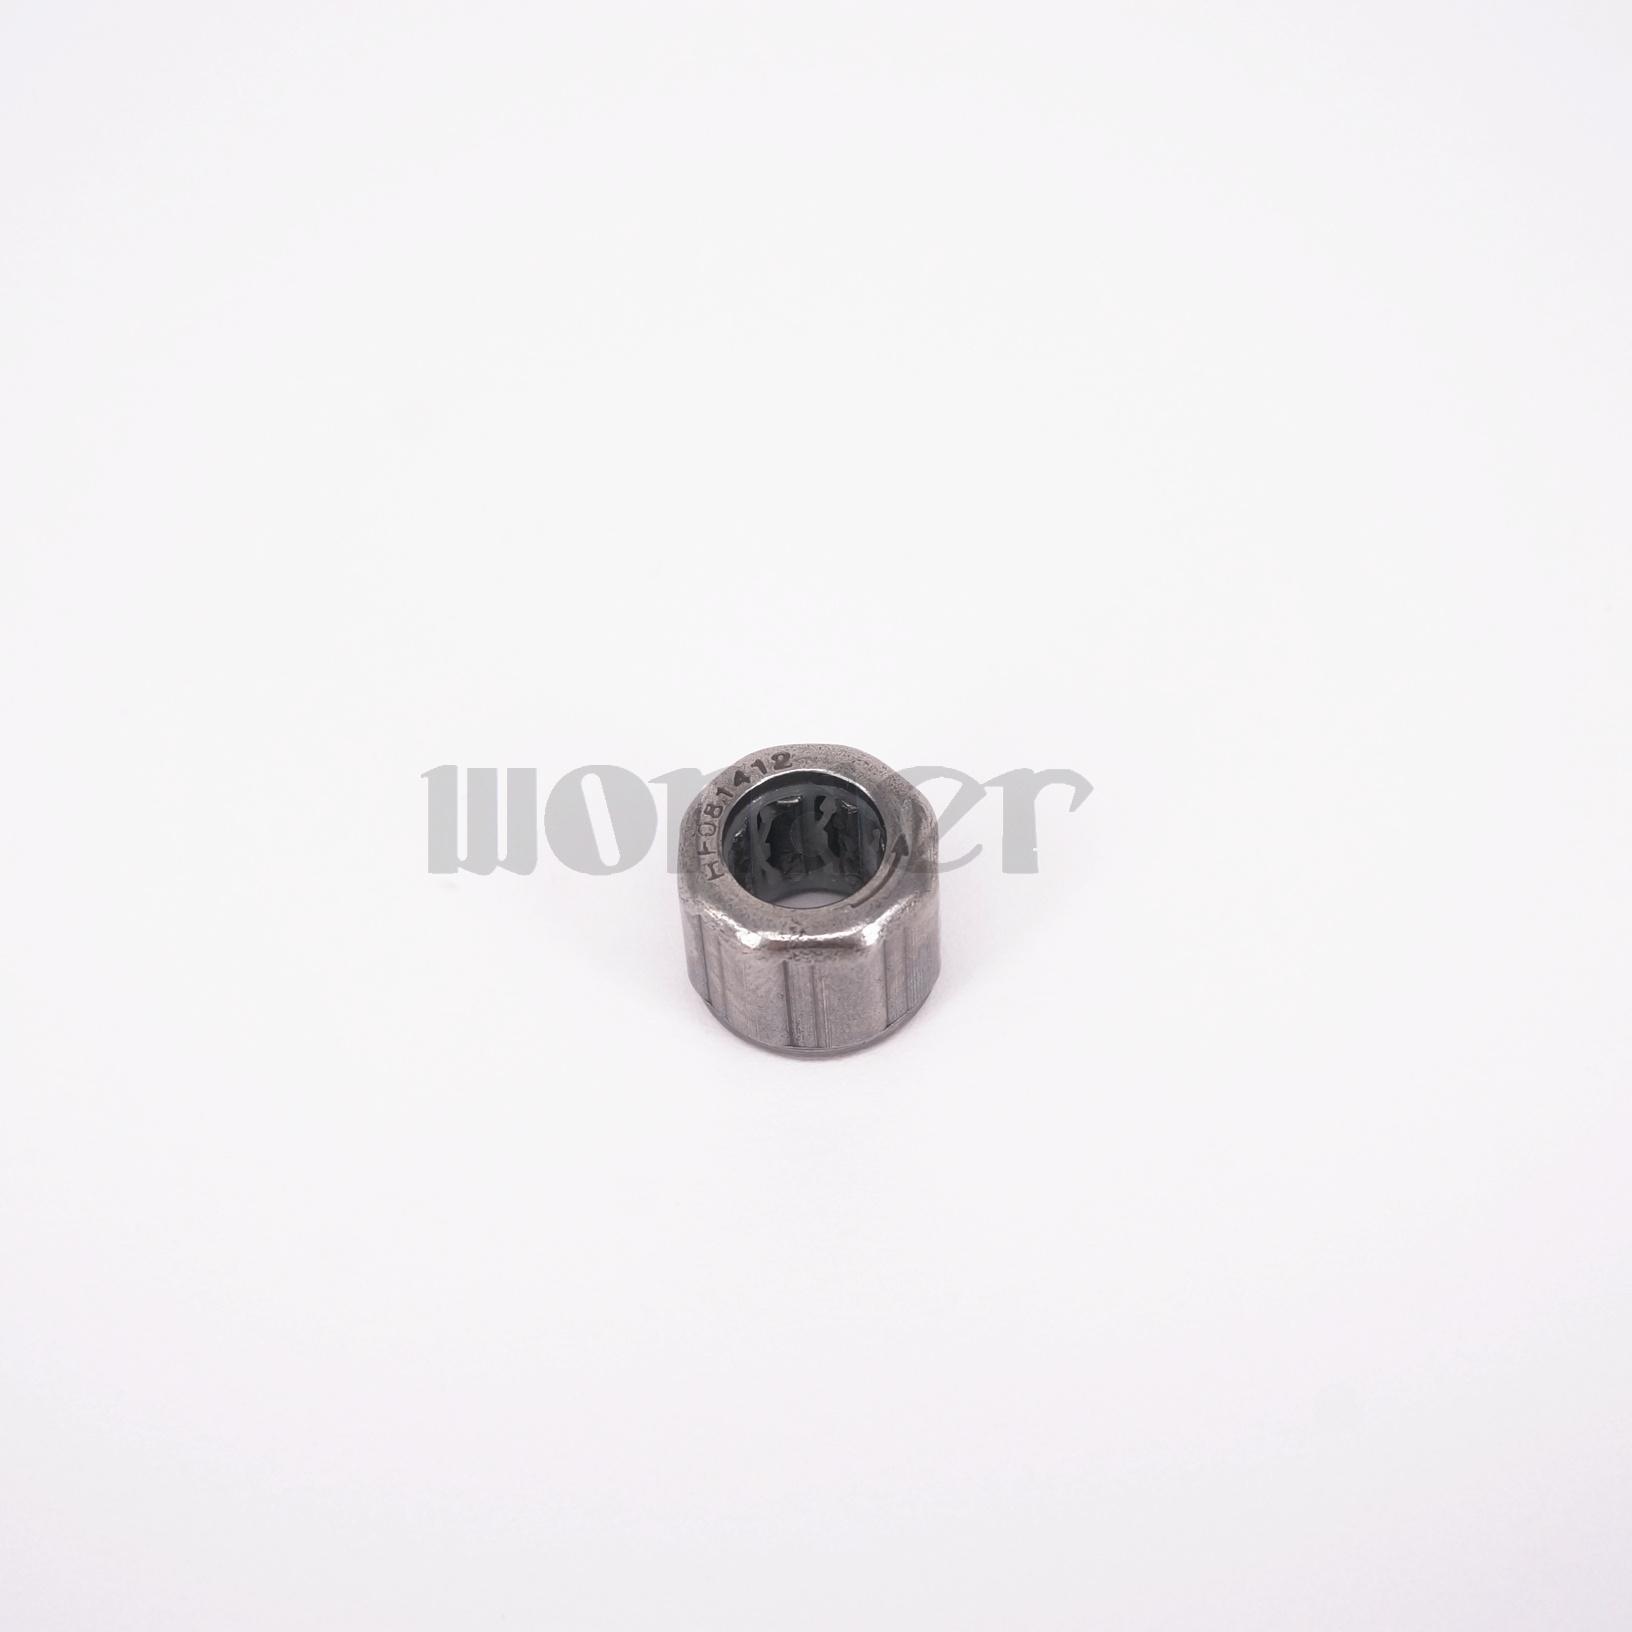 10pcs HF081412 8x14x12mm One Way Needle Roller Steel Bearing Knurling EasyMop